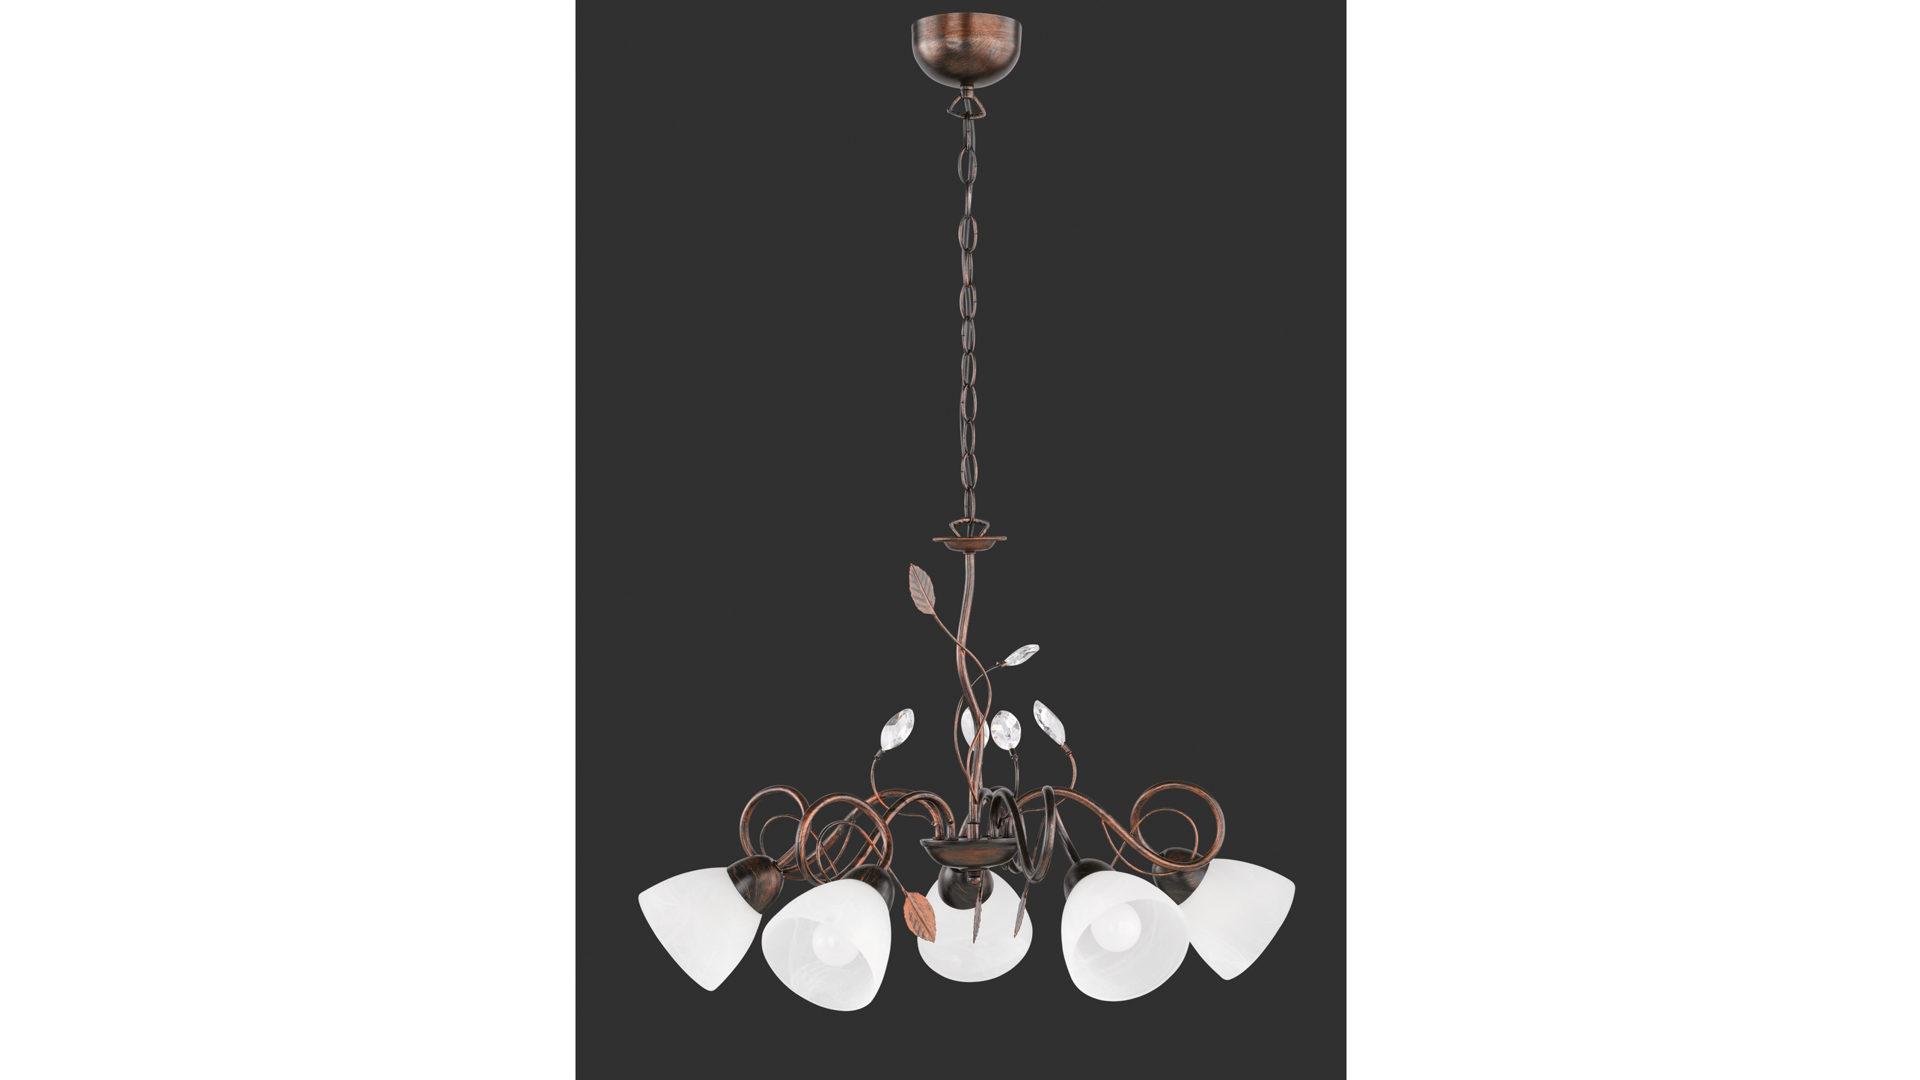 Kronleuchter Mit Lampenschirm ~ Kronleuchter antik rostfarbenes metall u fünf lampenschirme bad